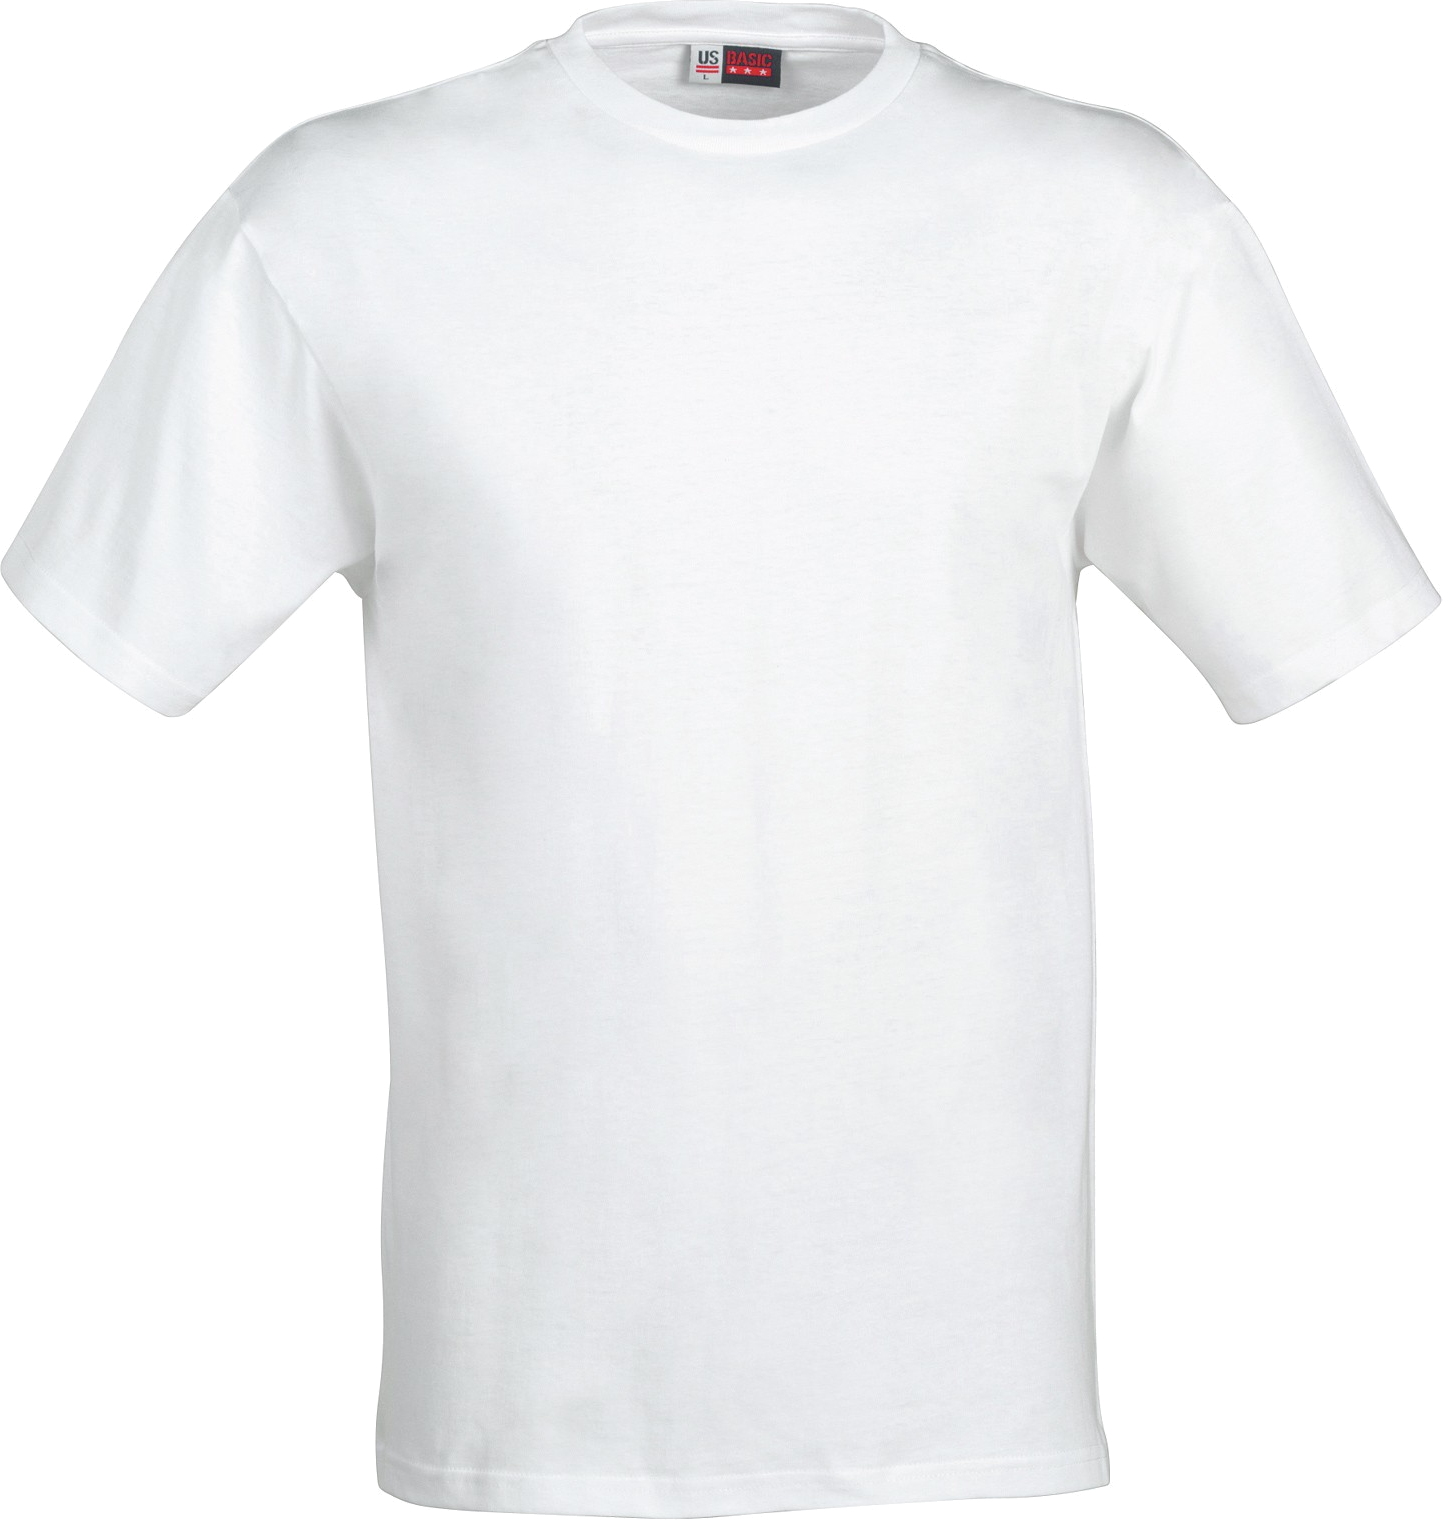 white shirt white t-shirt png image ZNKTVTG